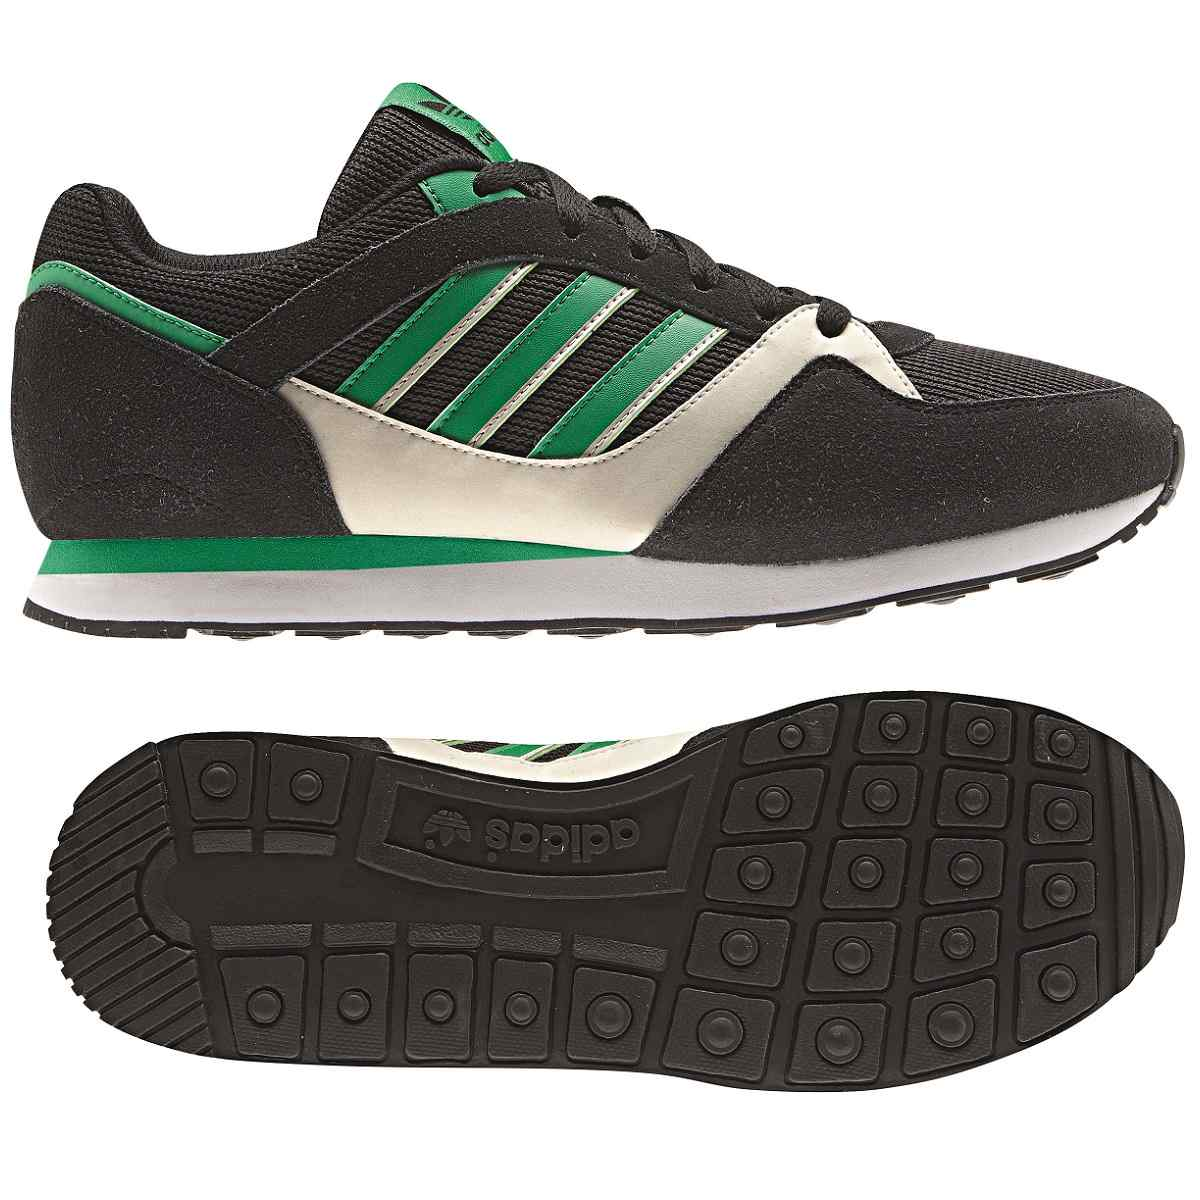 adidas originals zx100 schuhe turnschuhe sneaker herren. Black Bedroom Furniture Sets. Home Design Ideas